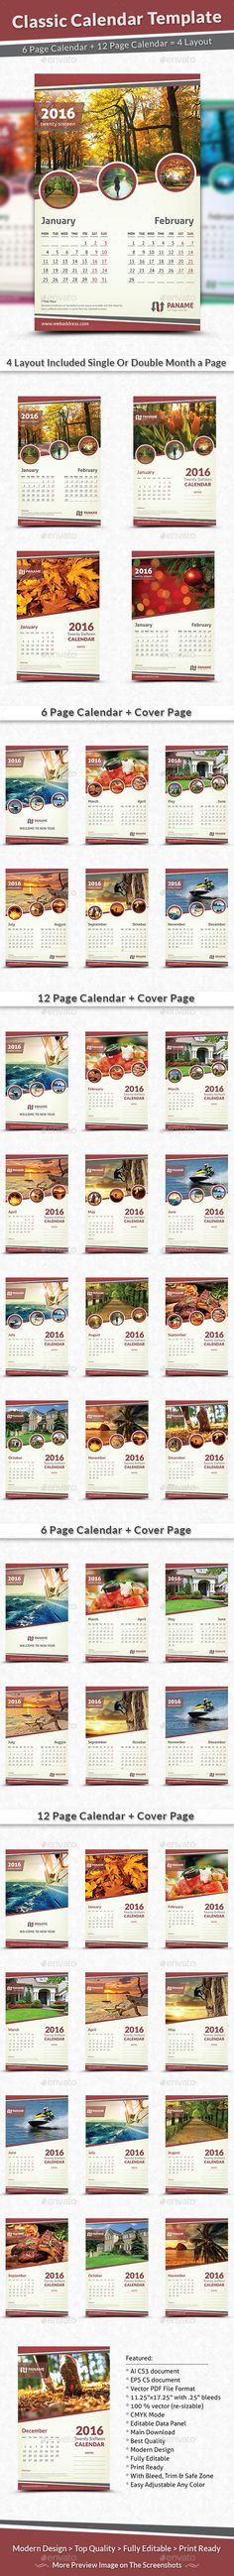 Painted Face Poster Calendar Template Calendar templates, Painted